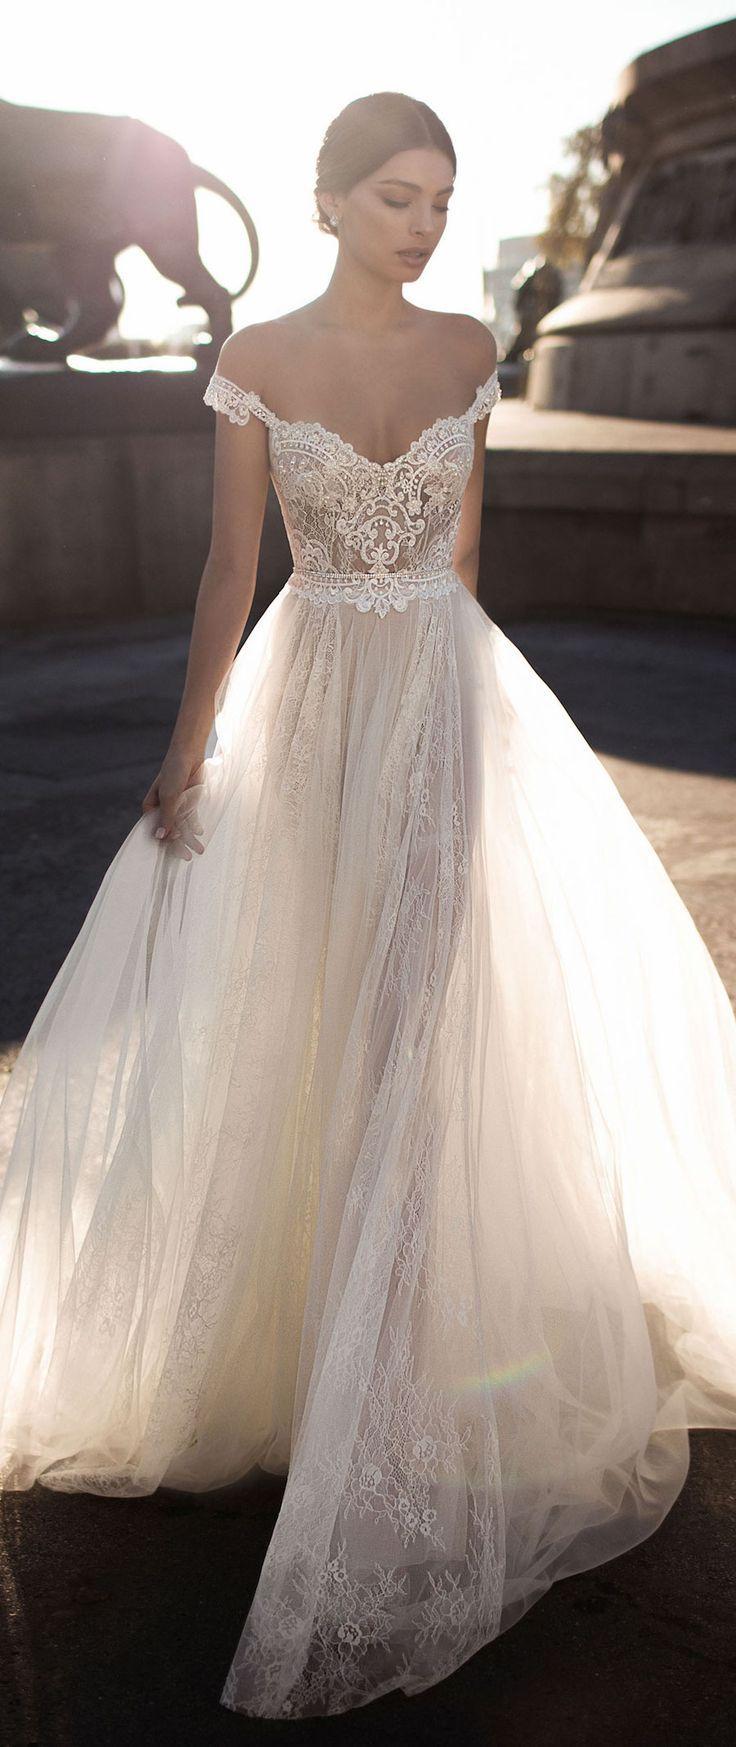 81eac0eab8d Gali Karten Wedding Dresses 2017 - Barcelona Bridal Collection ...